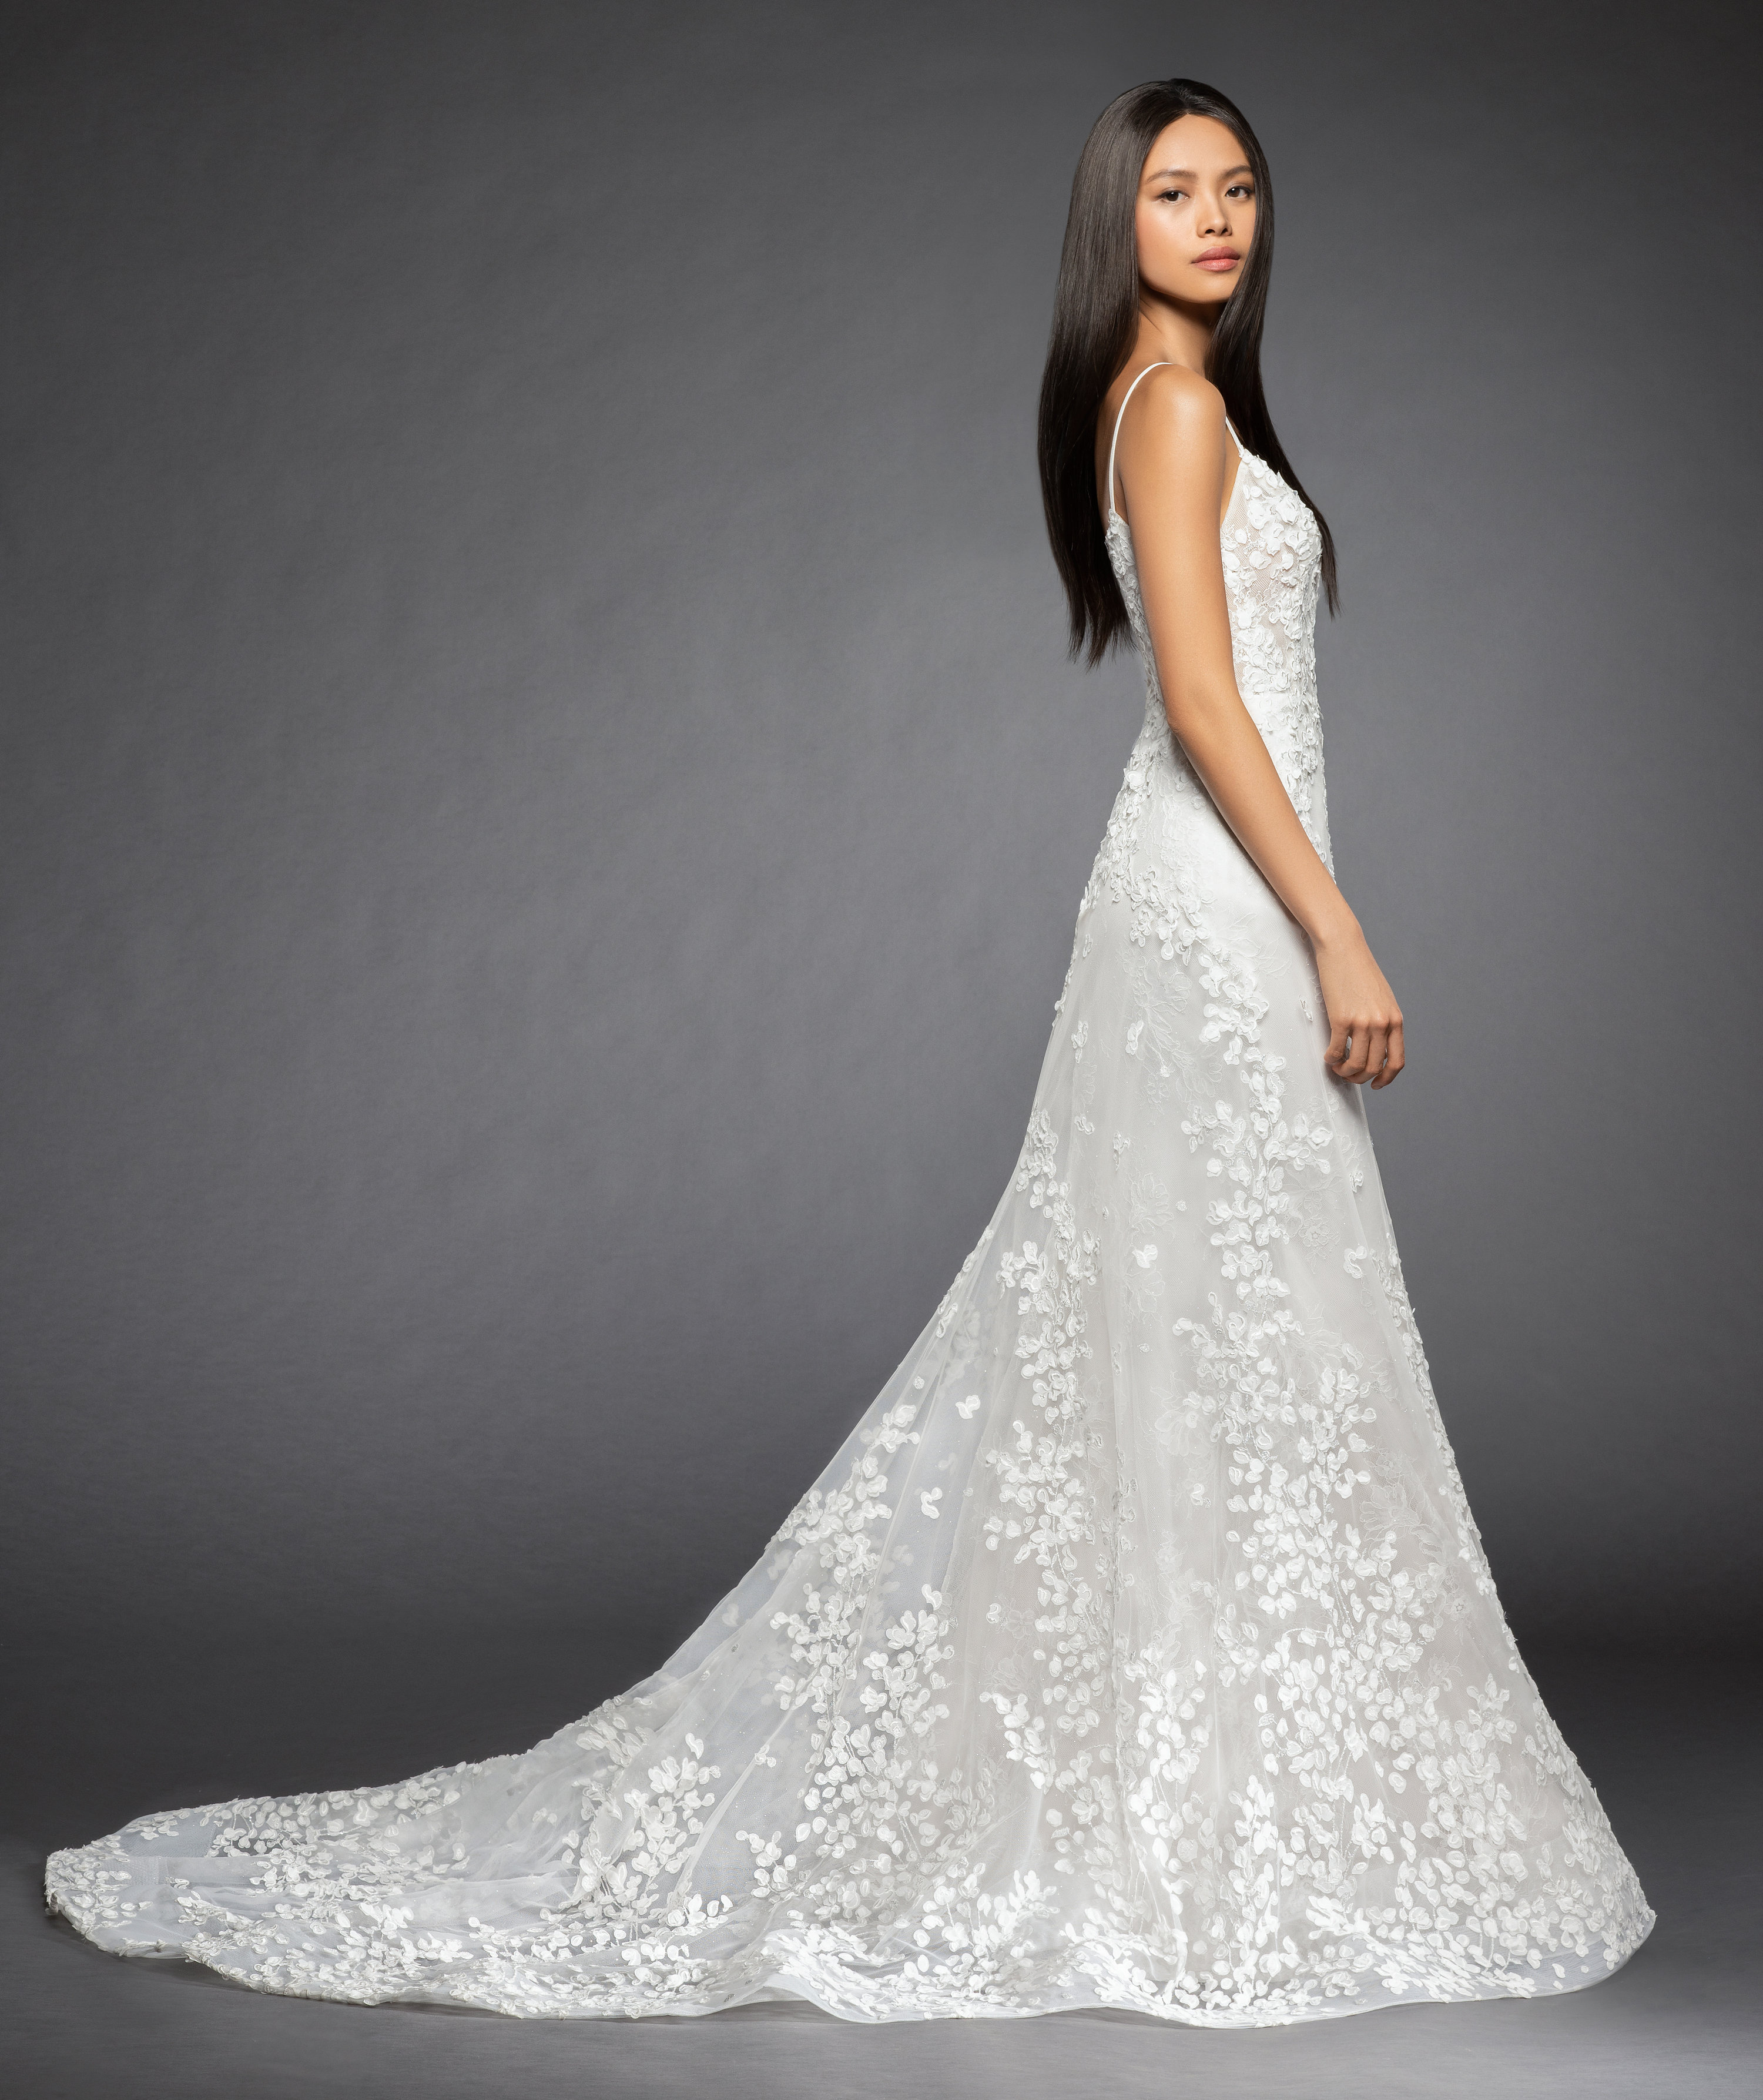 Spaghetti Strap Floral Applique A-line Wedding Dress